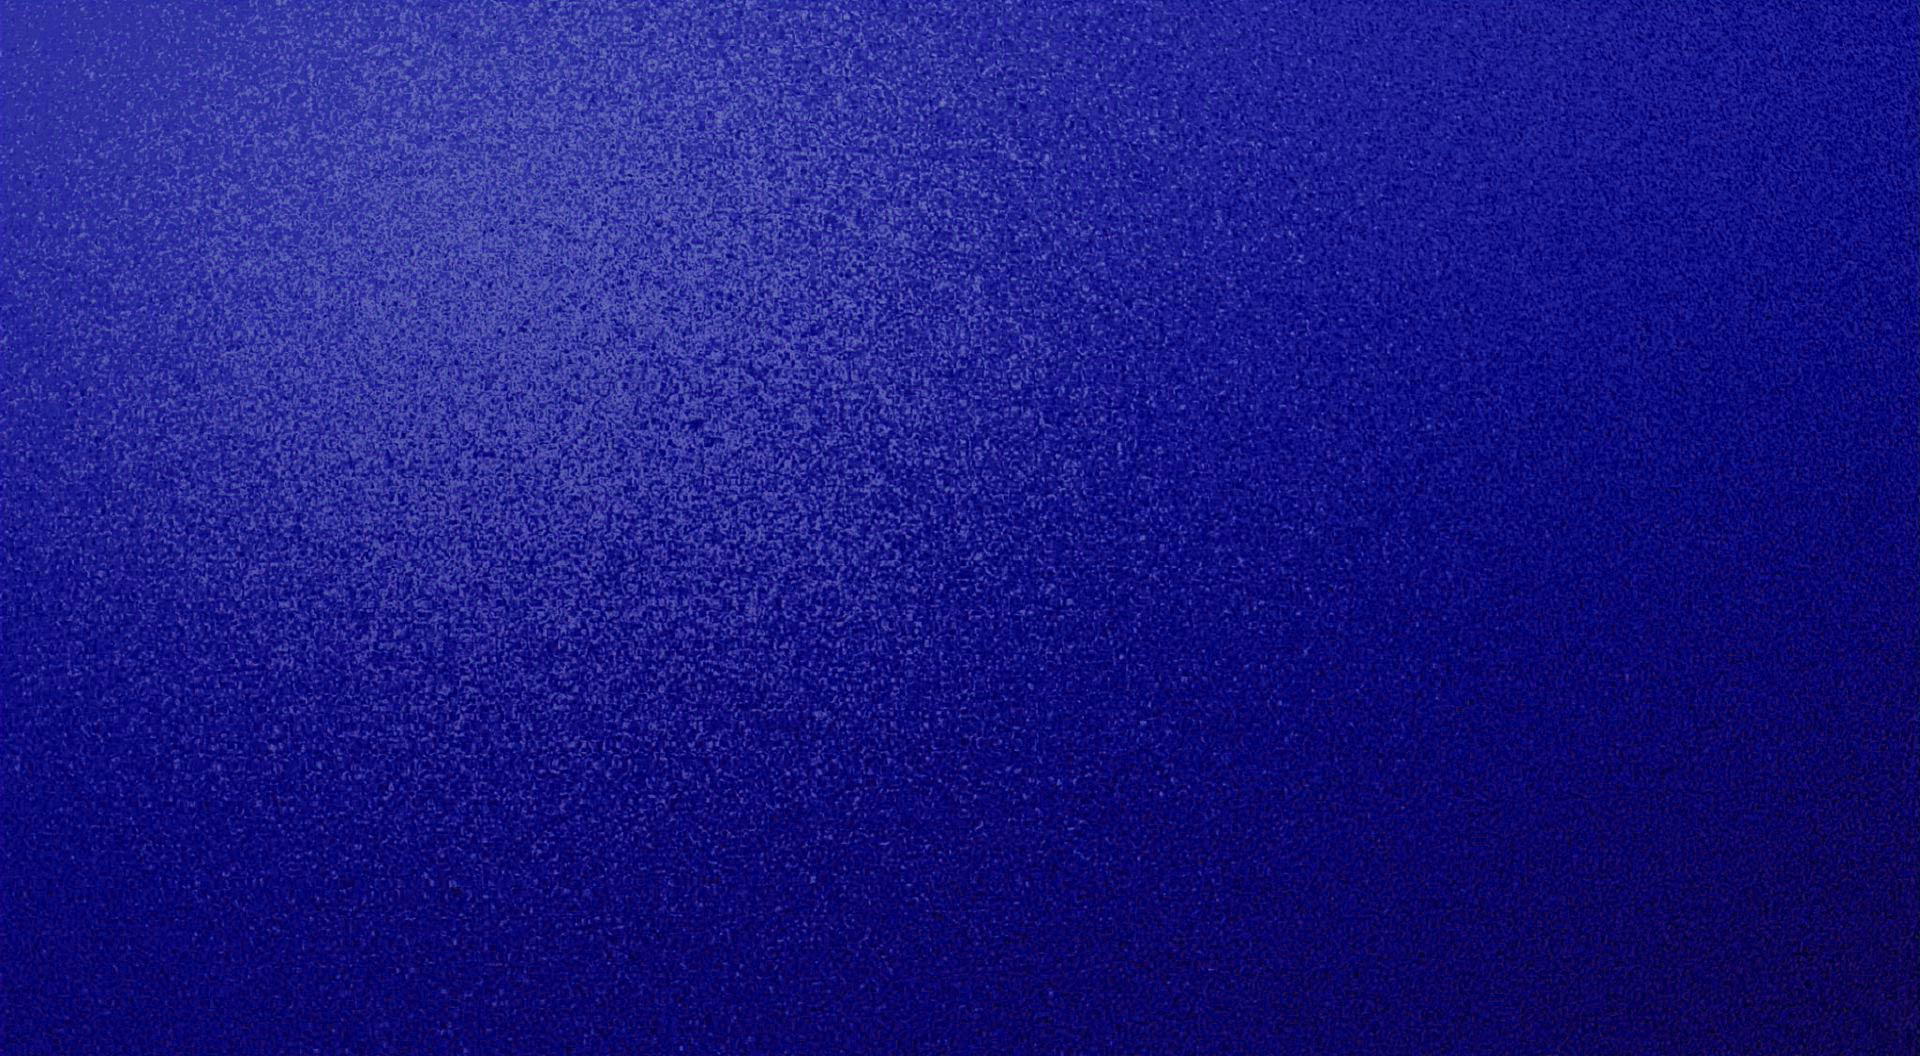 Dark blue background wallpaper wallpapersafari for Dark blue and gold wallpaper